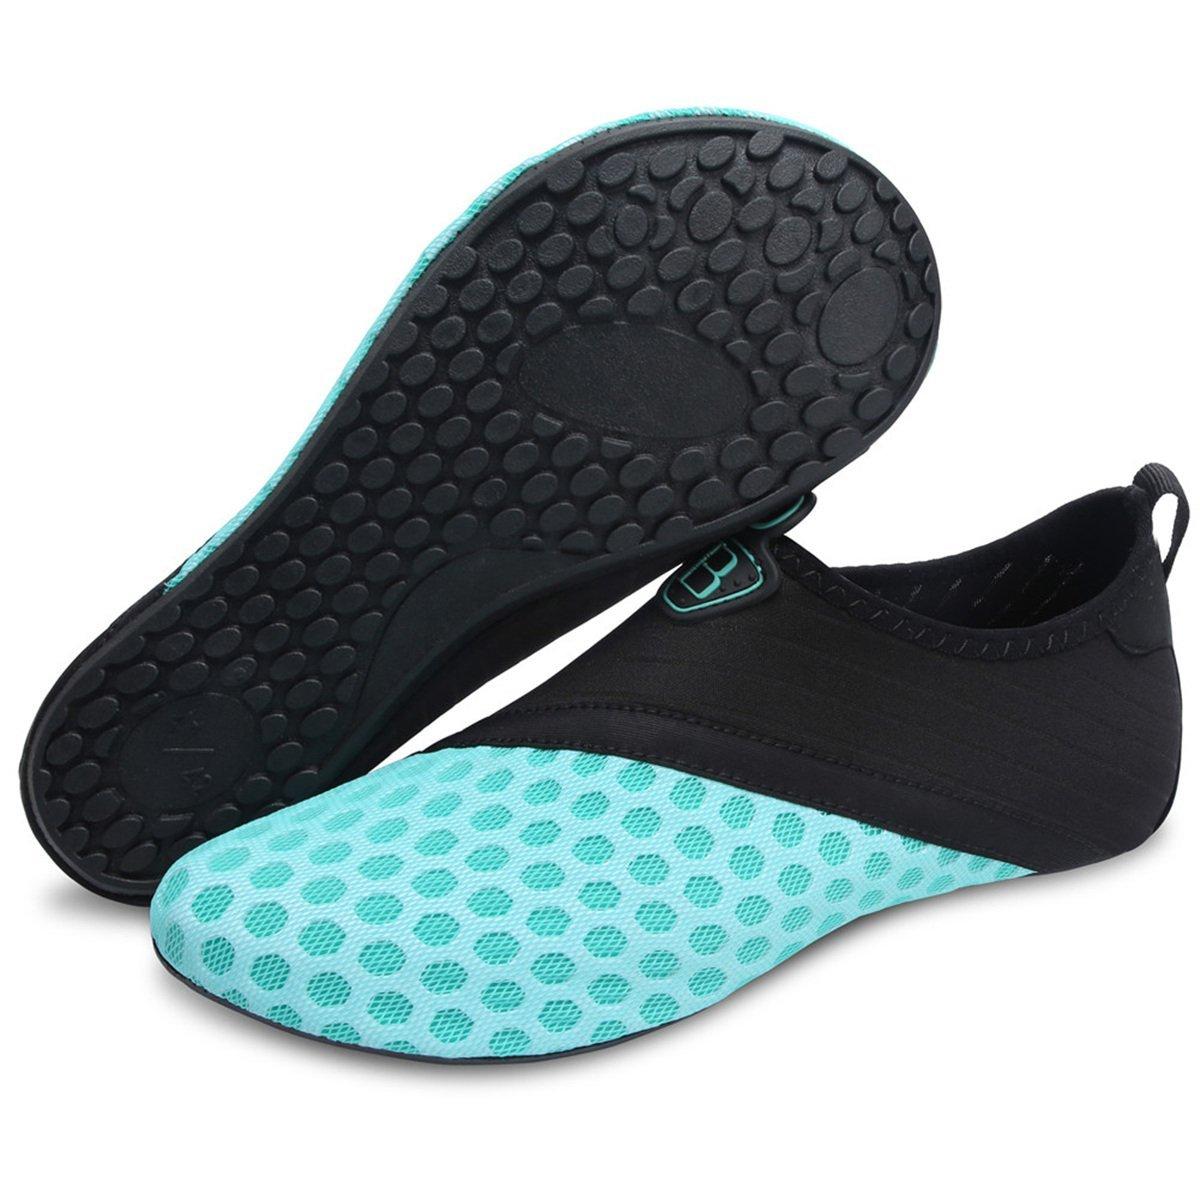 Barerun Barefoot Quick-Dry Water Sports Shoes Aqua Socks for Swim Beach Pool Surf Yoga for Women Men 8.5-9.5 US Women by Barerun (Image #1)